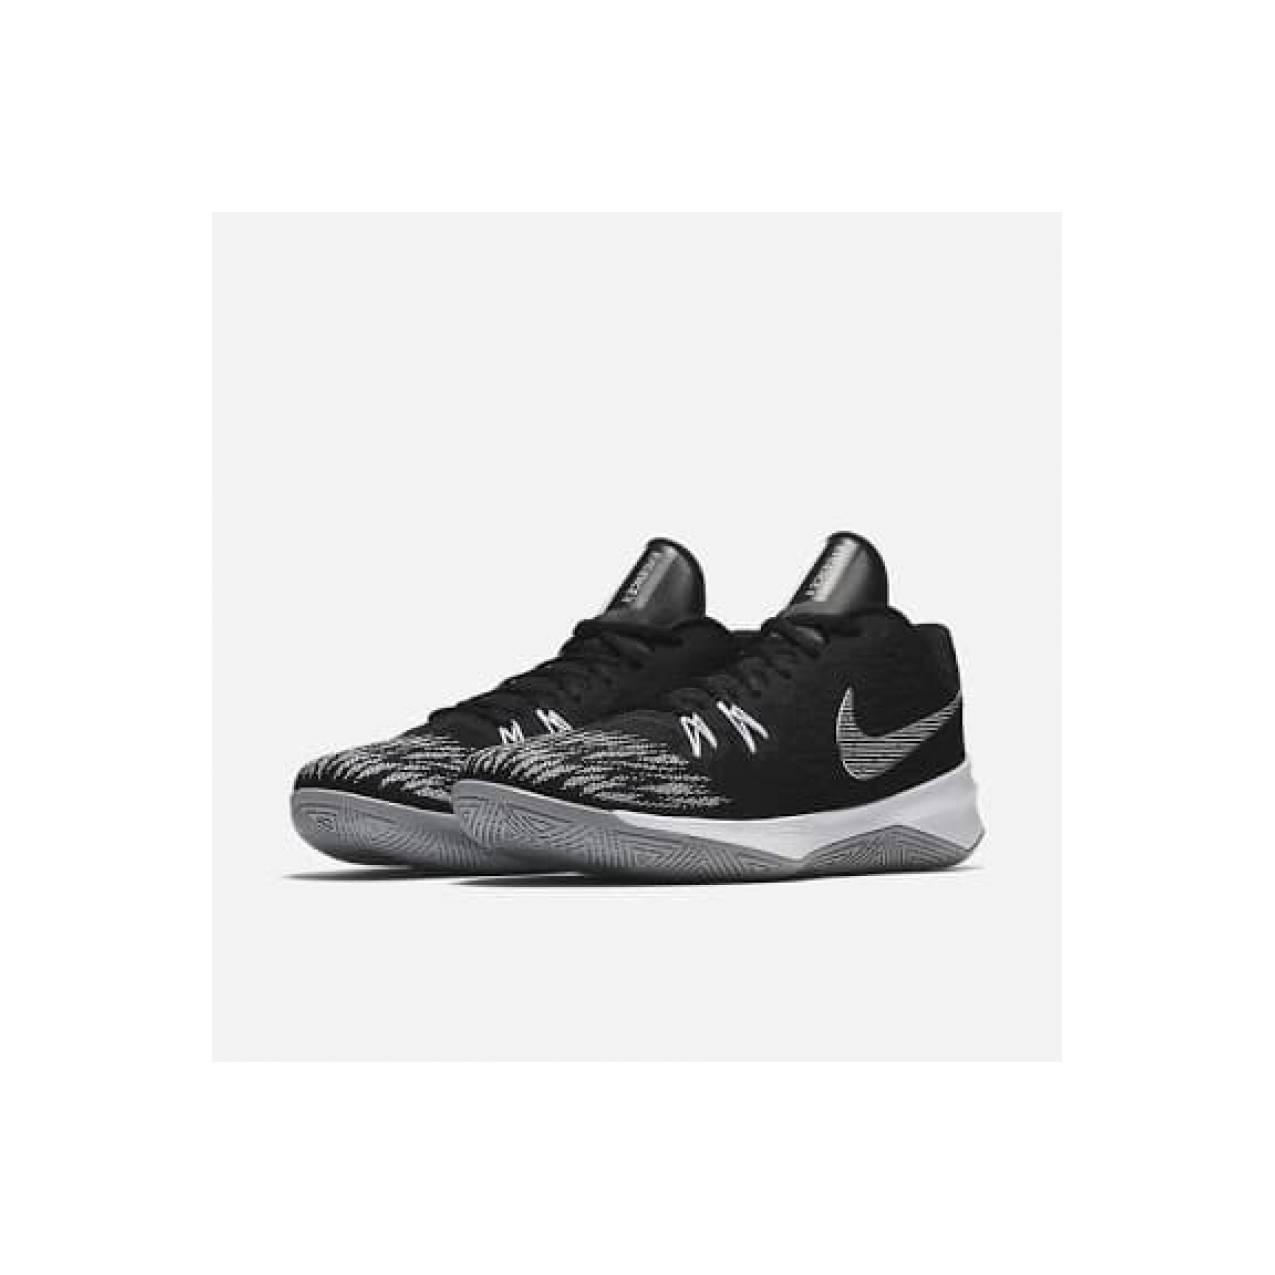 Sepatu Olahraga Basket NIKE Zoom Evidence II 908976 001 Murah Original